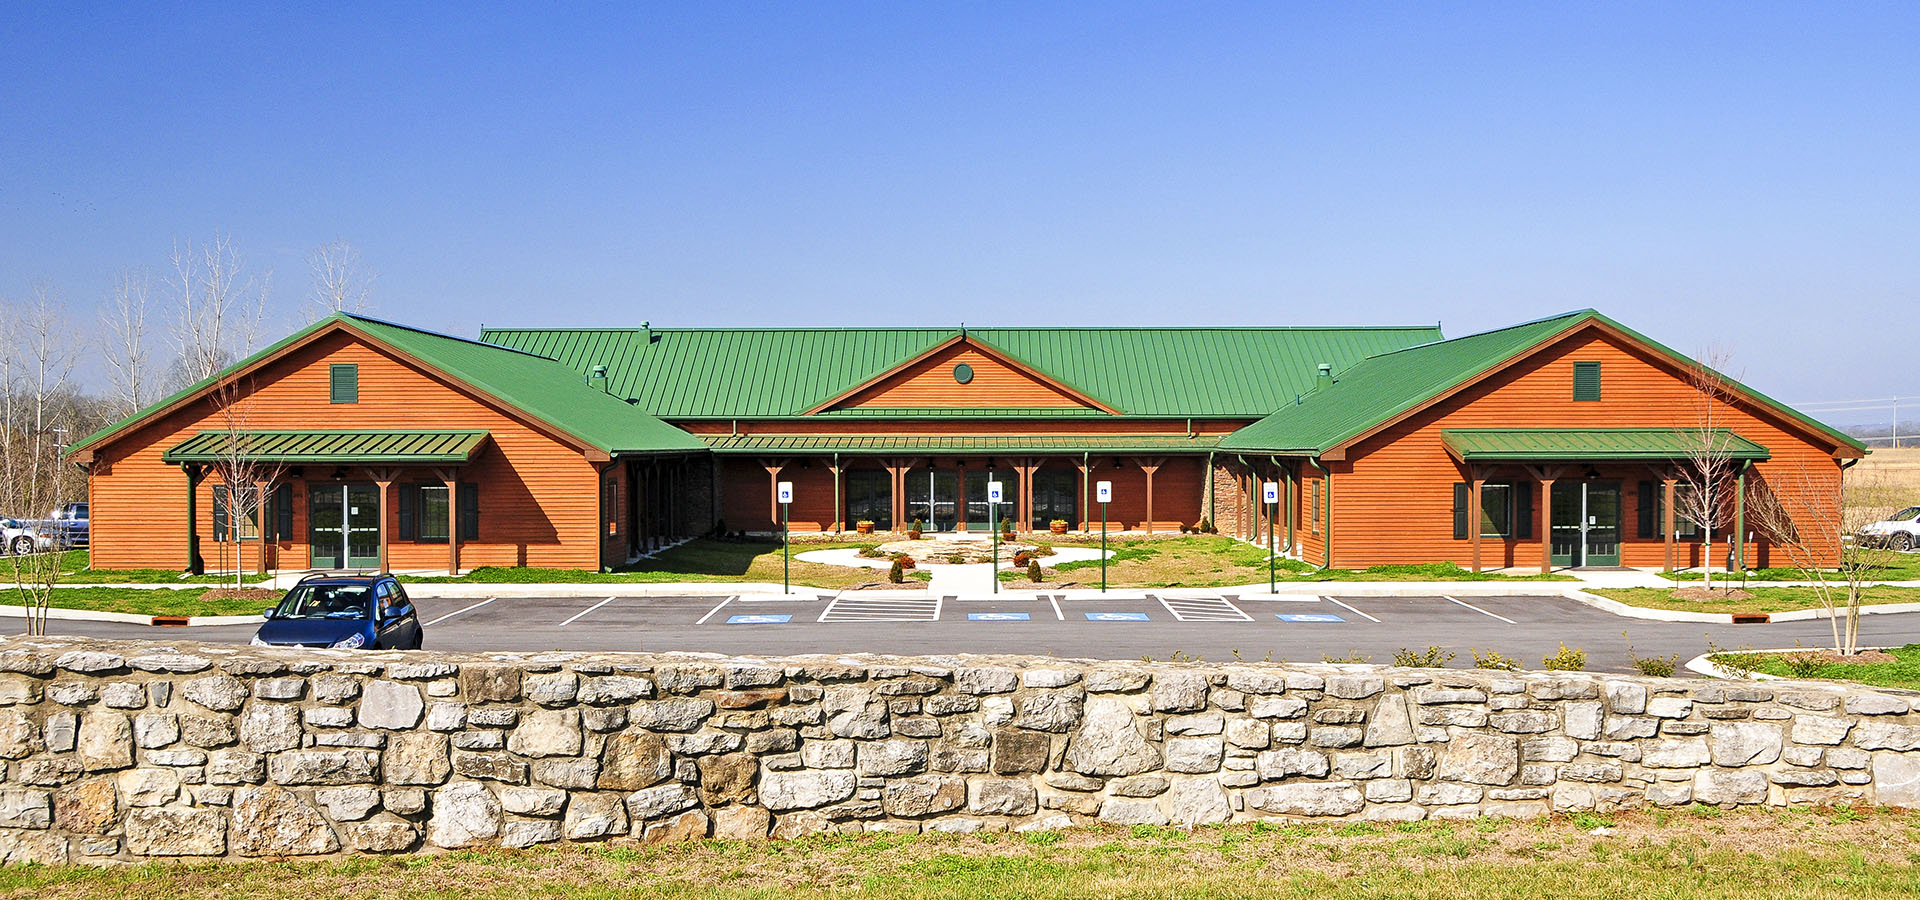 South Central TN Development Department | Mt. Pleasant, Tennessee | Brindley Construction, LLC.